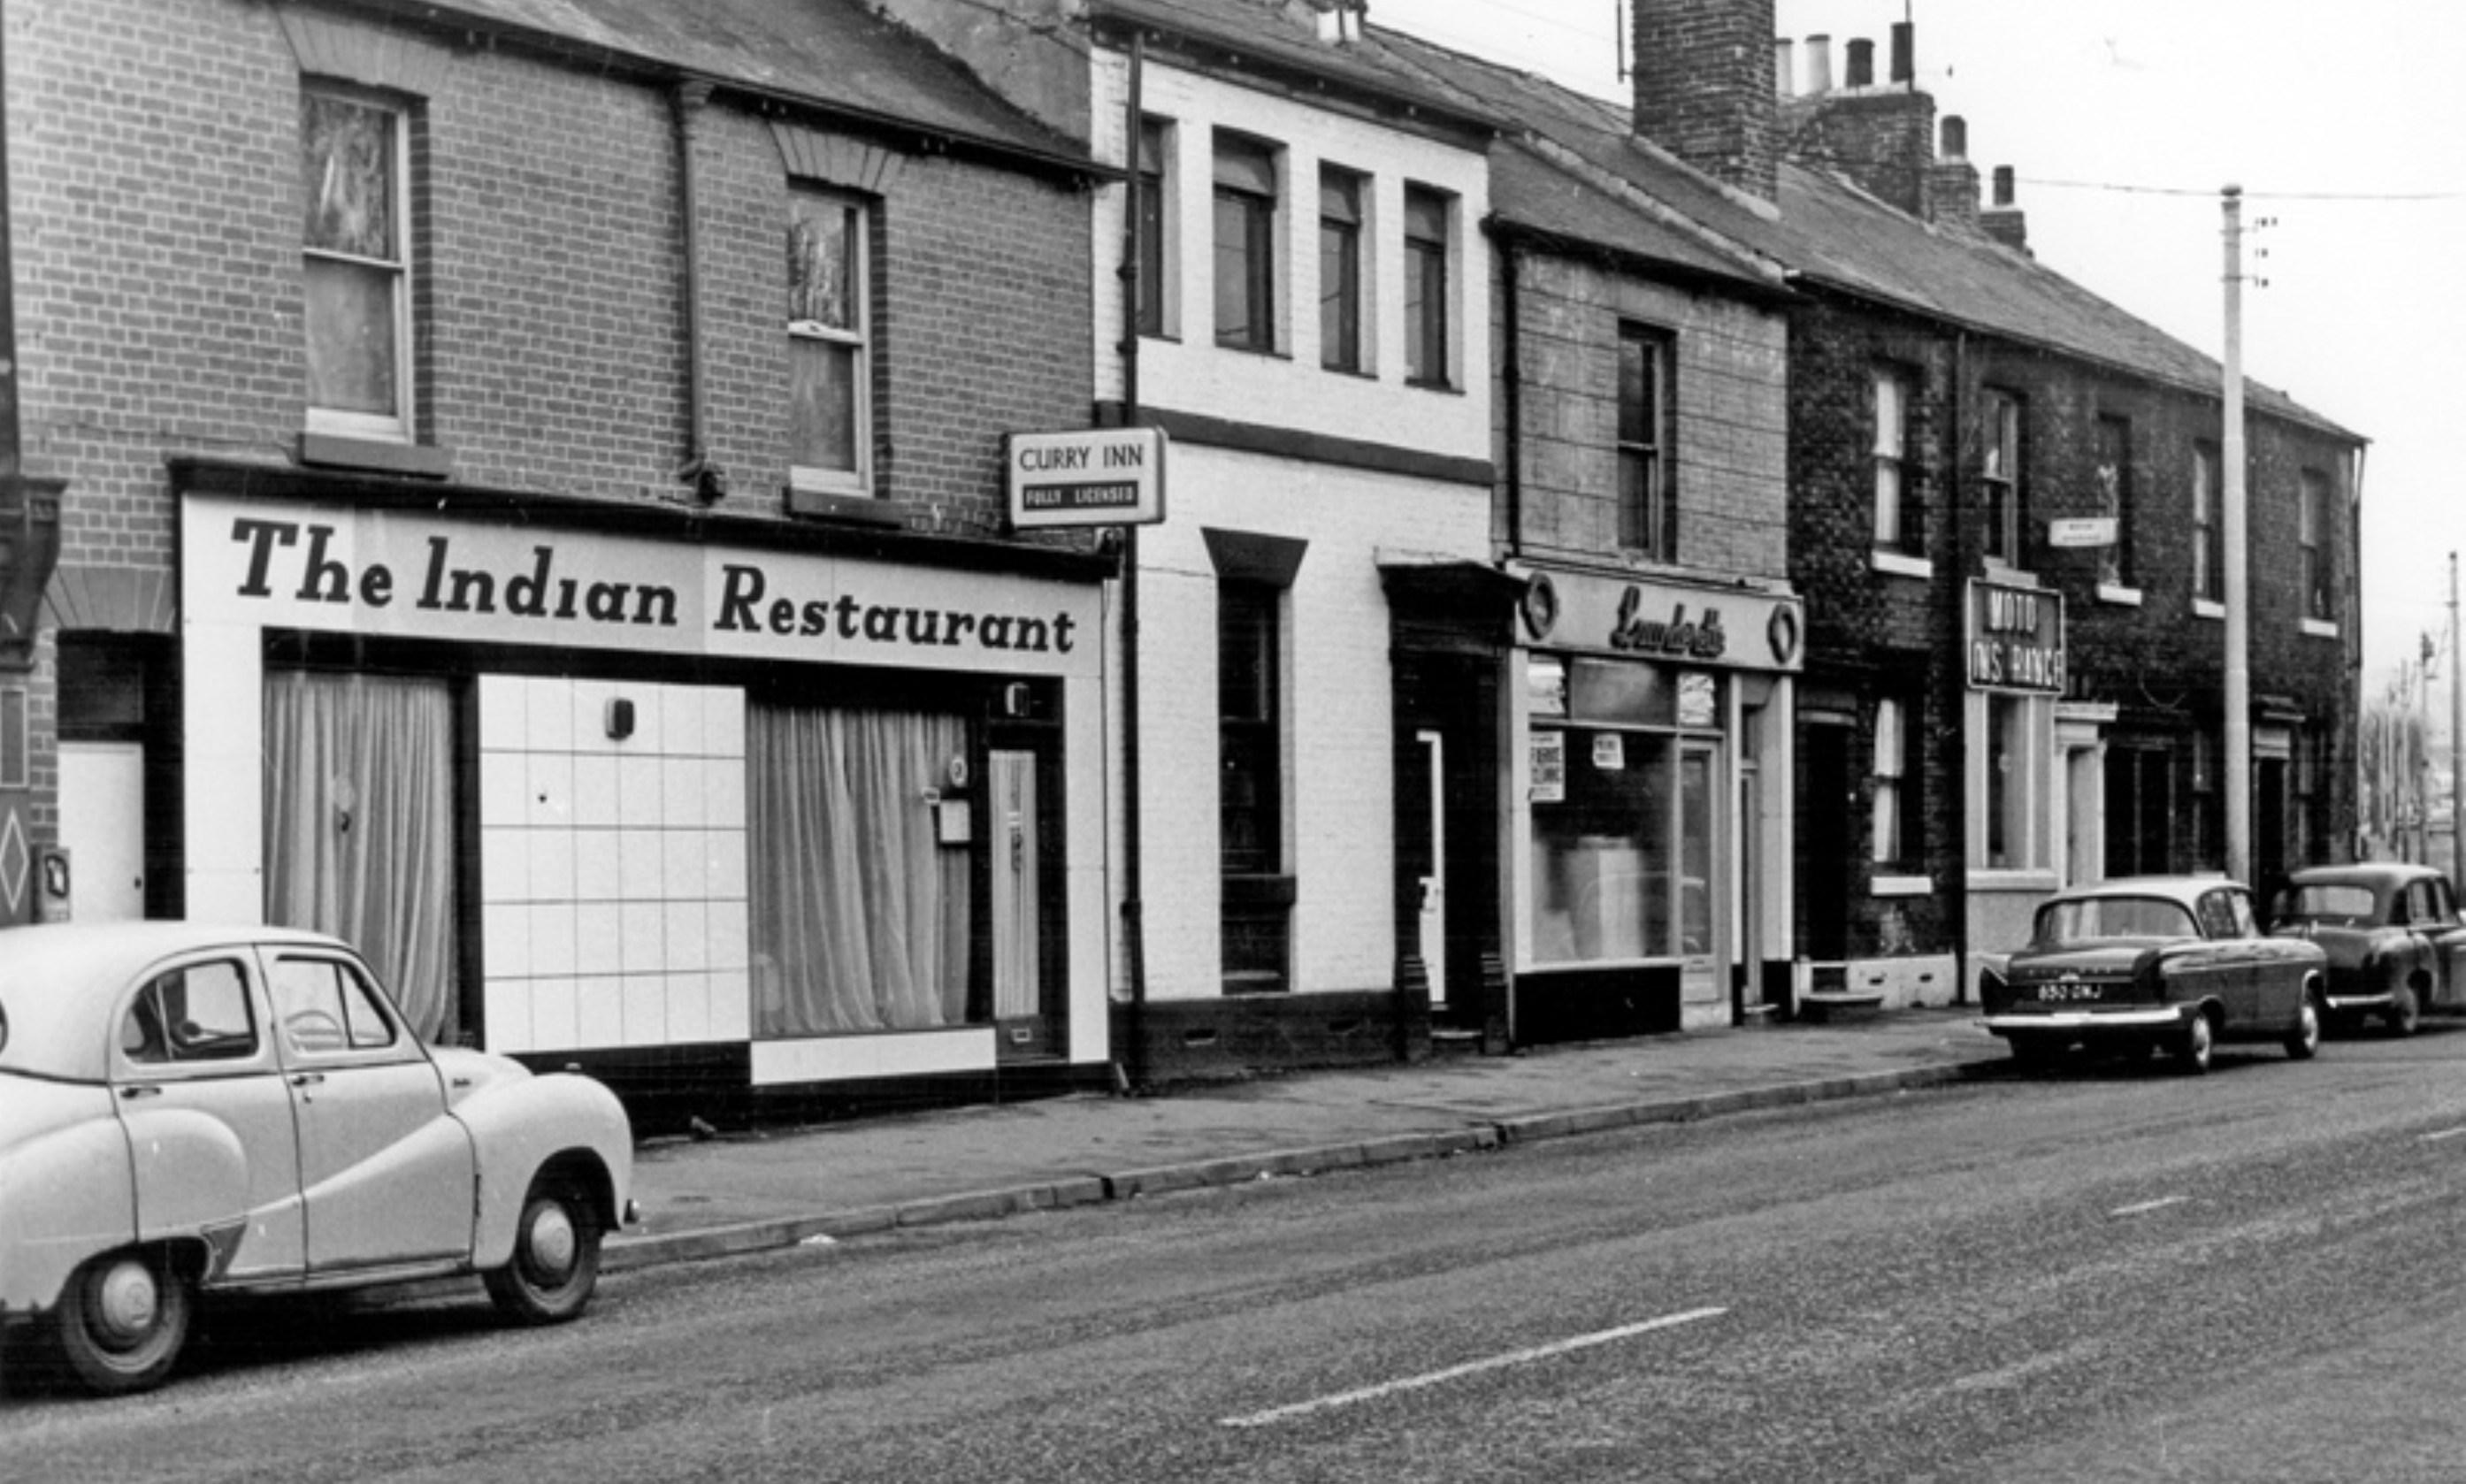 Sheffield's First Indian Restaurant